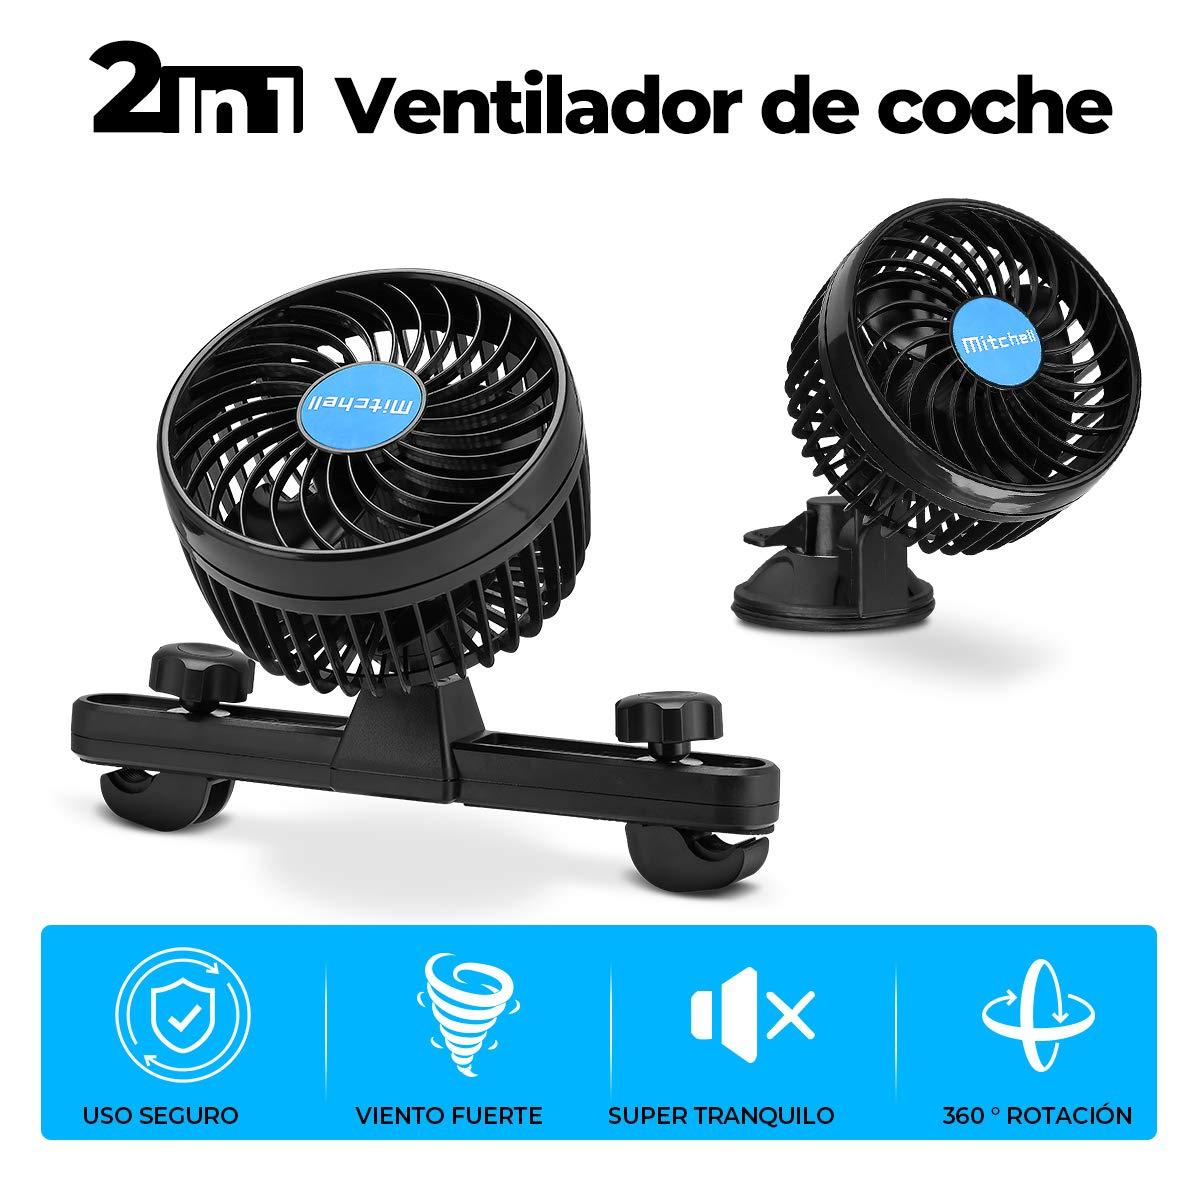 Amazon.es: Ventilador Coche Mechero Portatil Electrico Silencioso 12V Mini Fan de 360 Grados Rotativo 2 Soportes Velocidad Ajustable para Caravana, Furgoneta